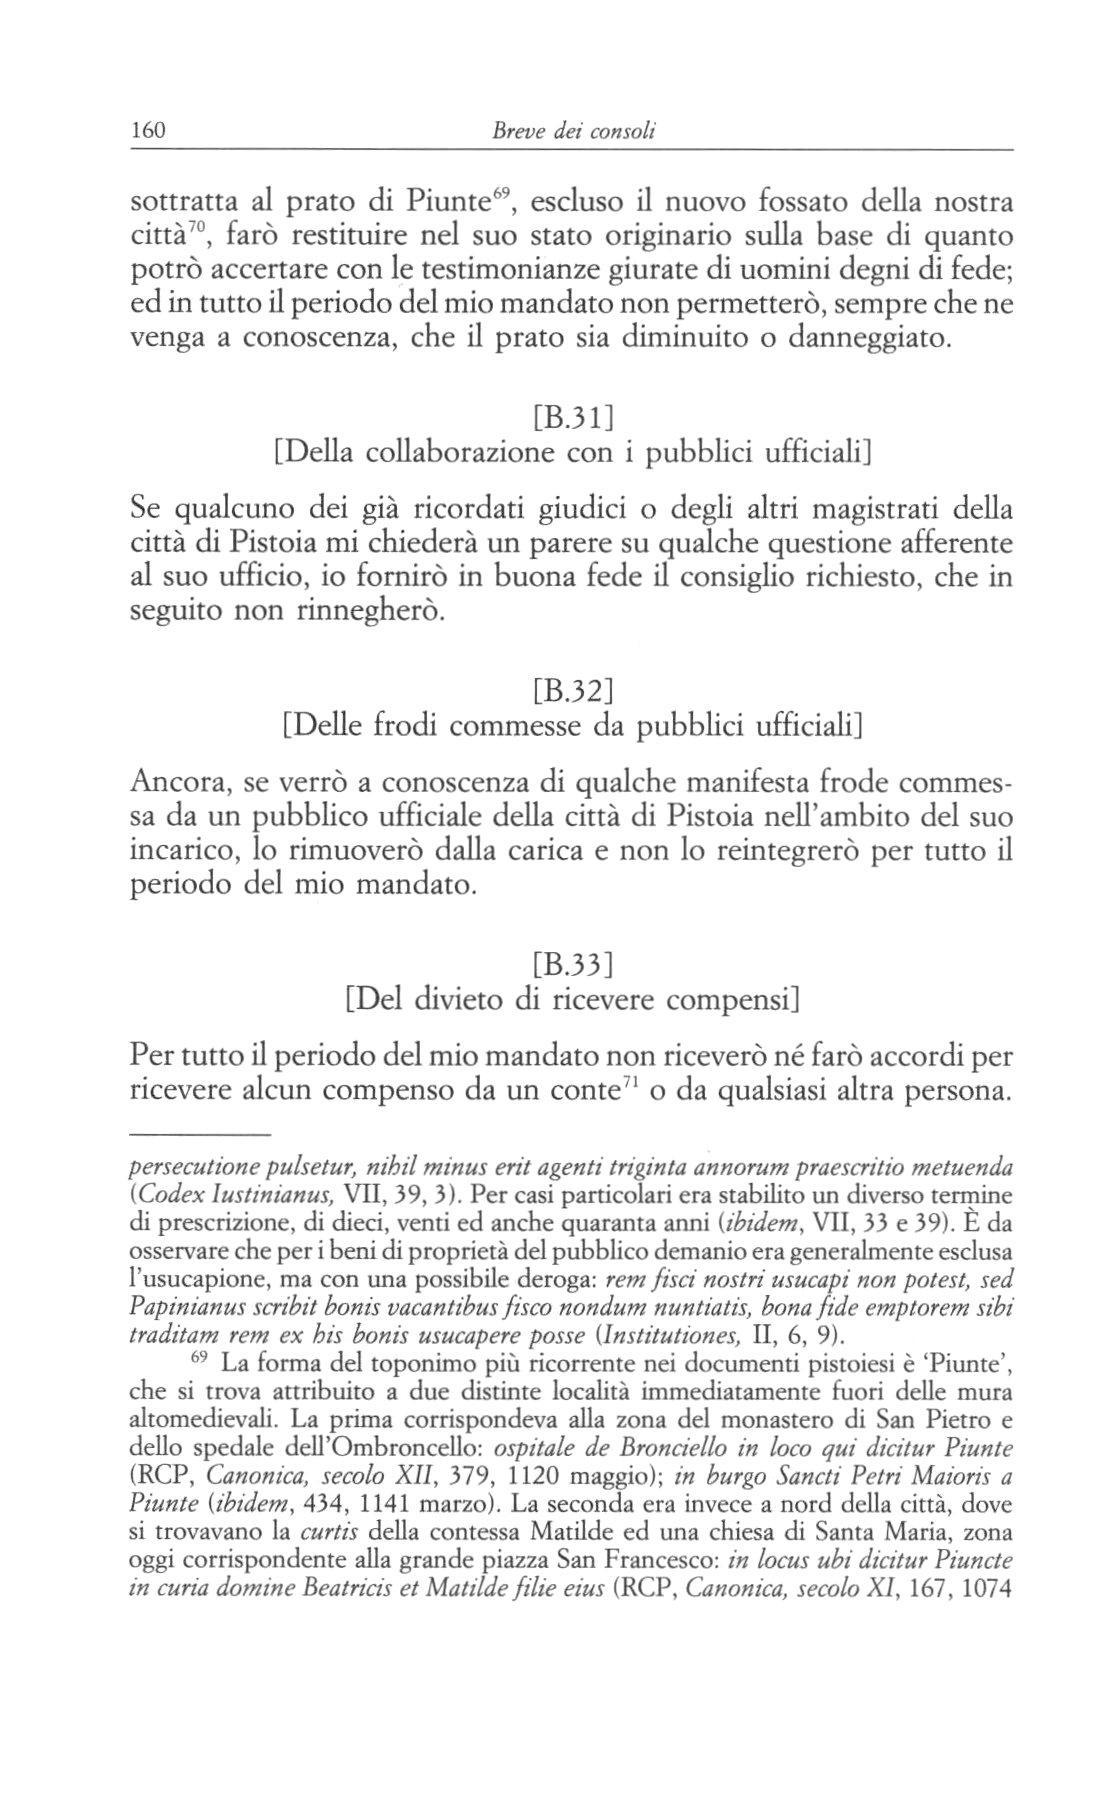 statuti pistoiesi del sec.XII 0160.jpg